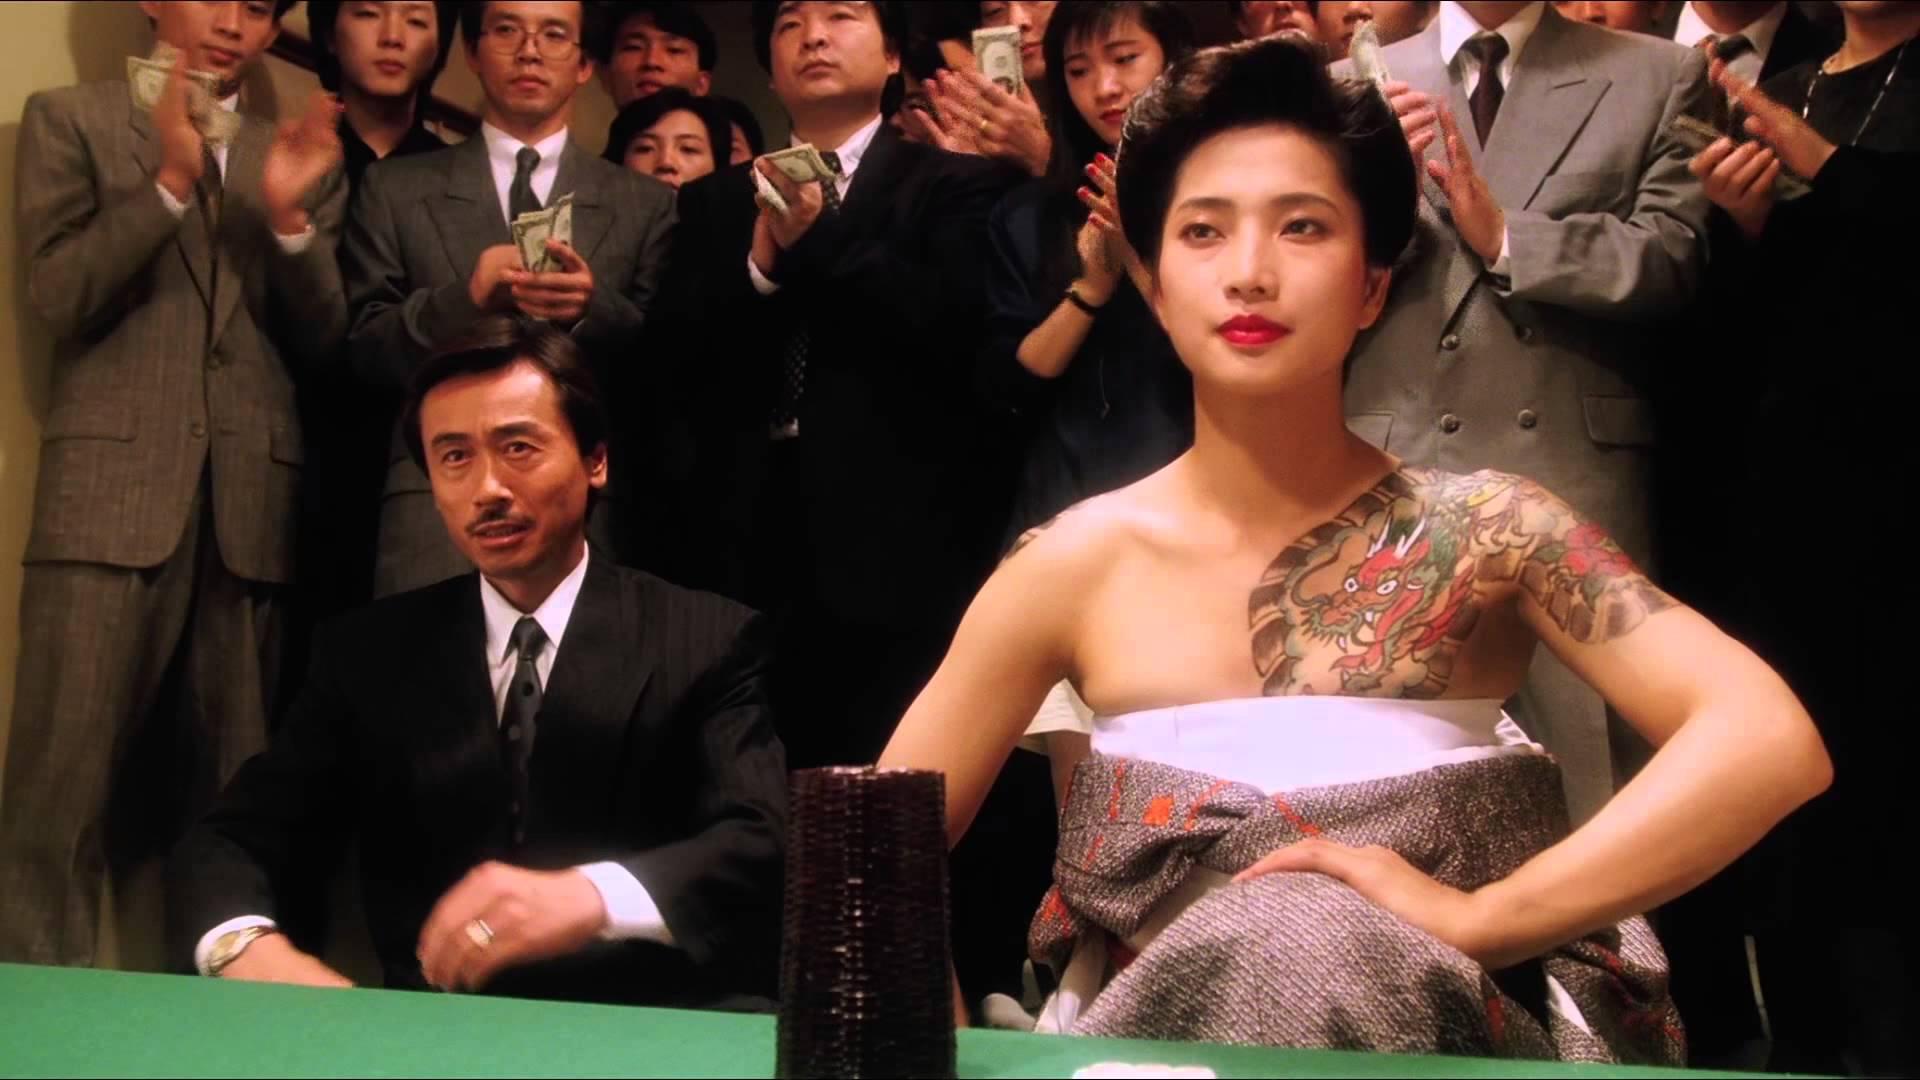 God of gambling full movie legalized gambling in virginia